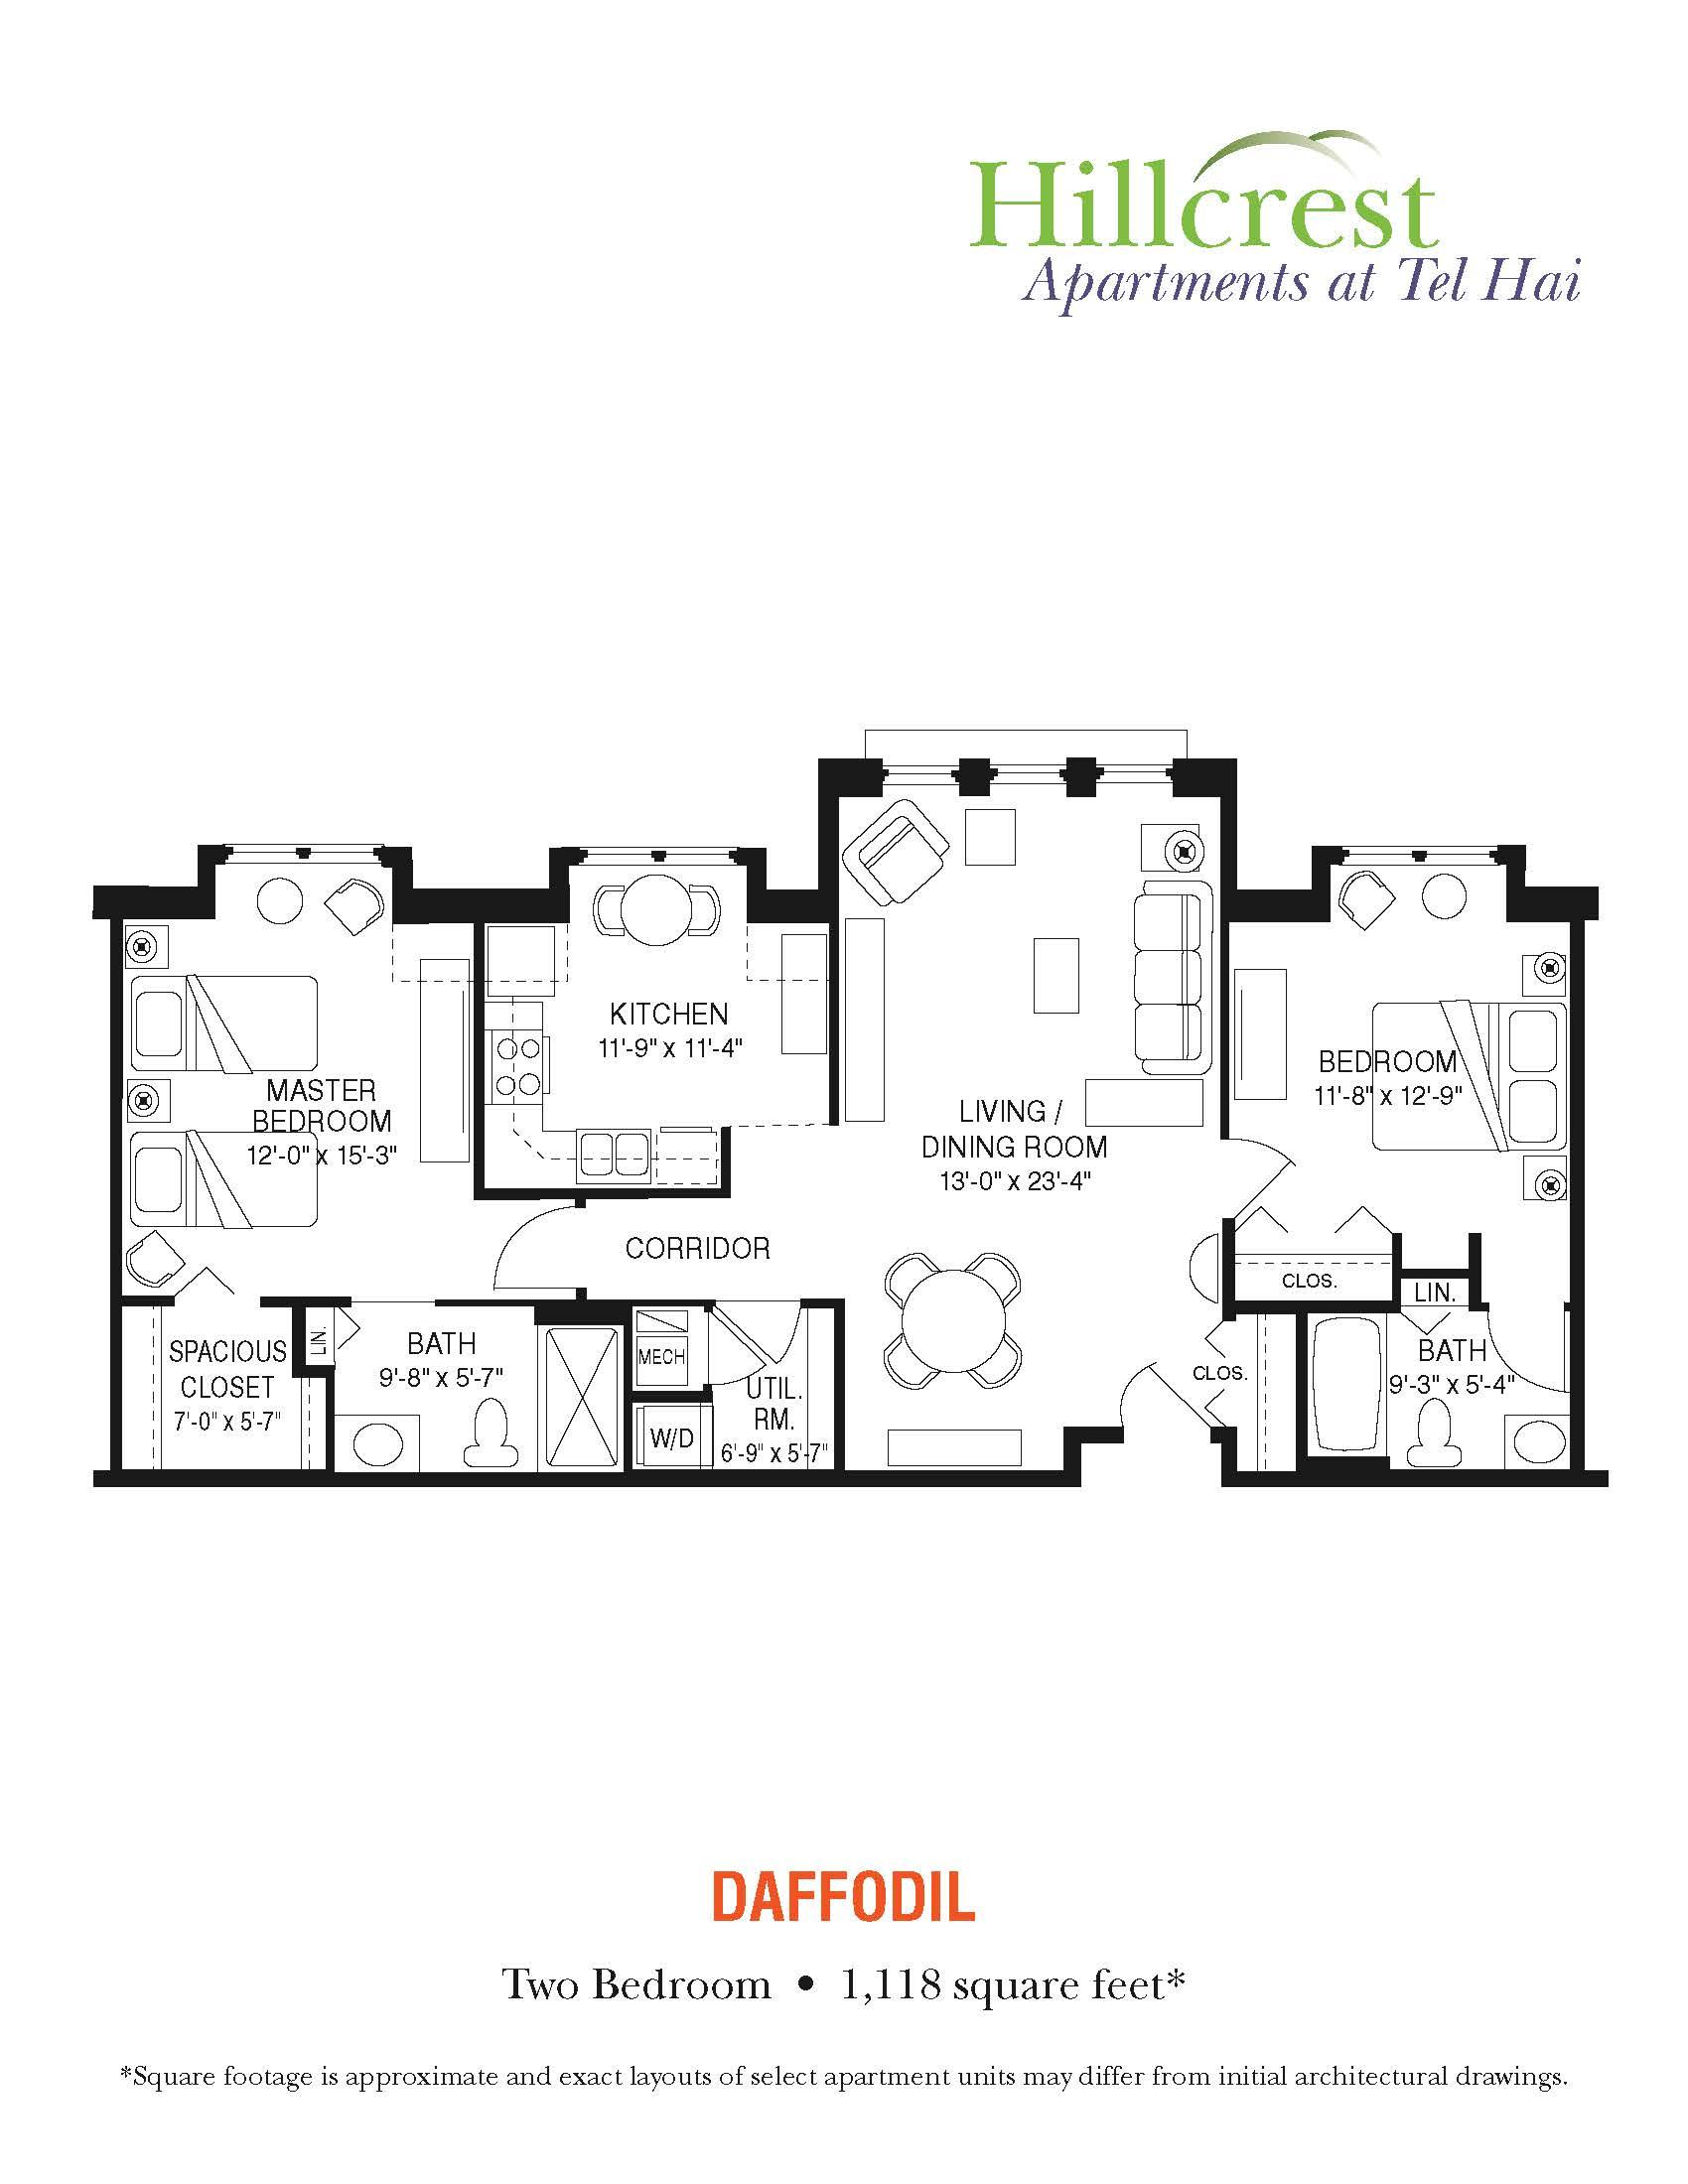 Daffodil Apartment at Tel Hai